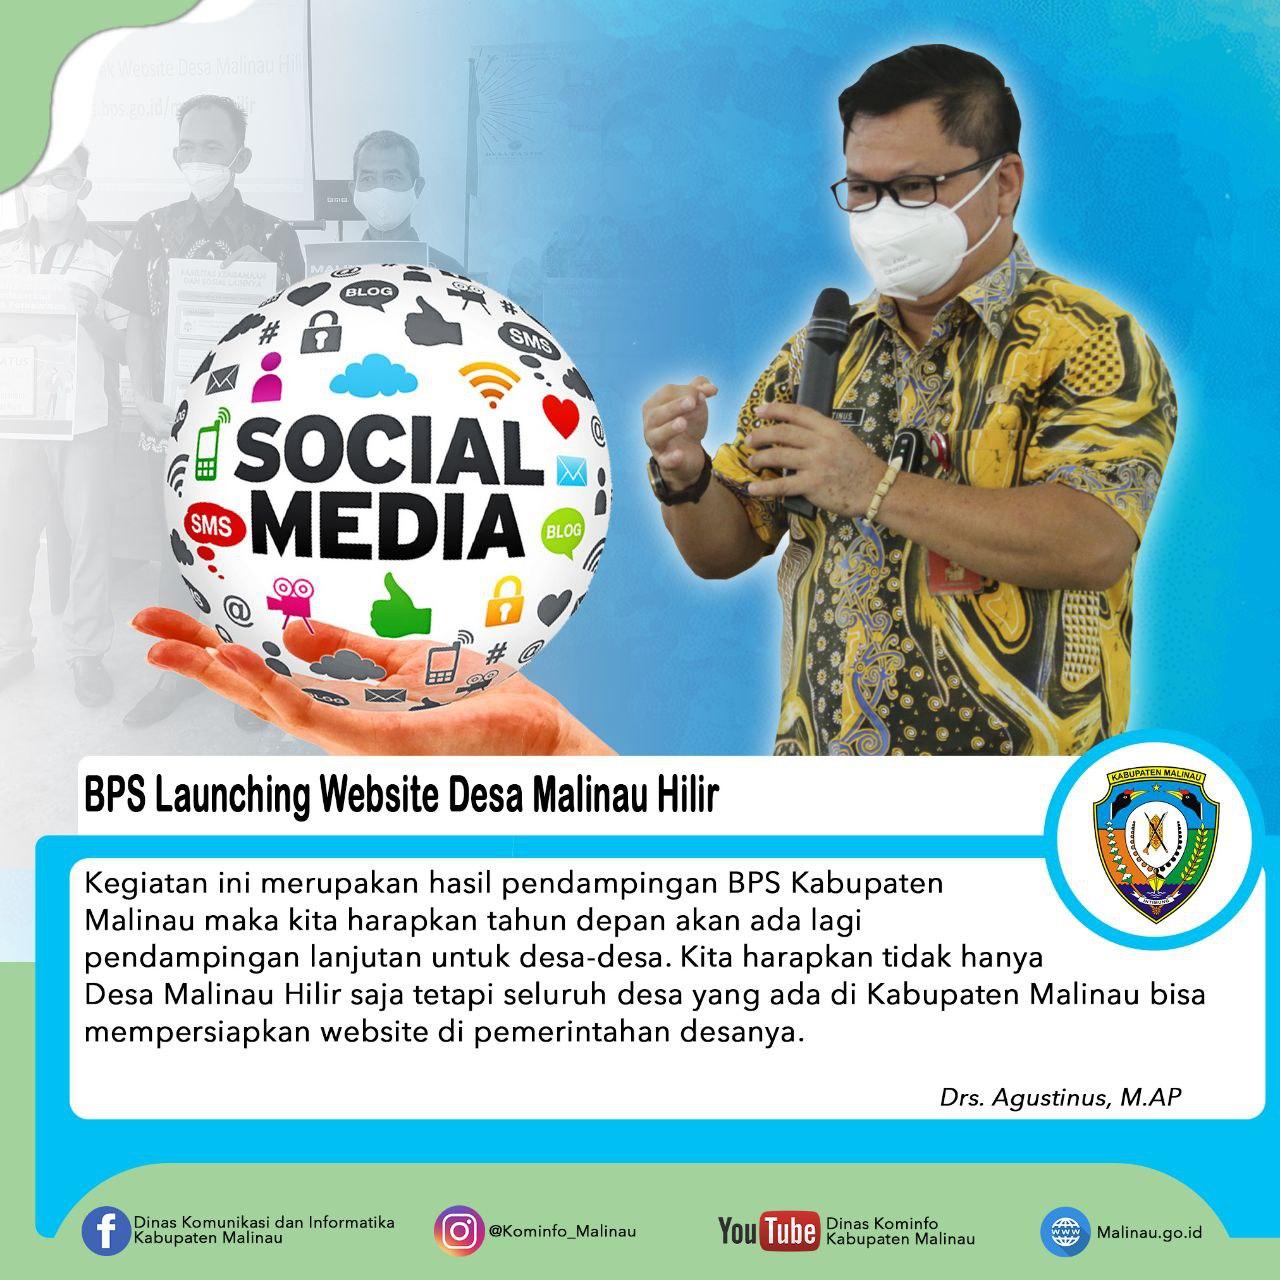 bps-launching-website-desa-malinau-hilir